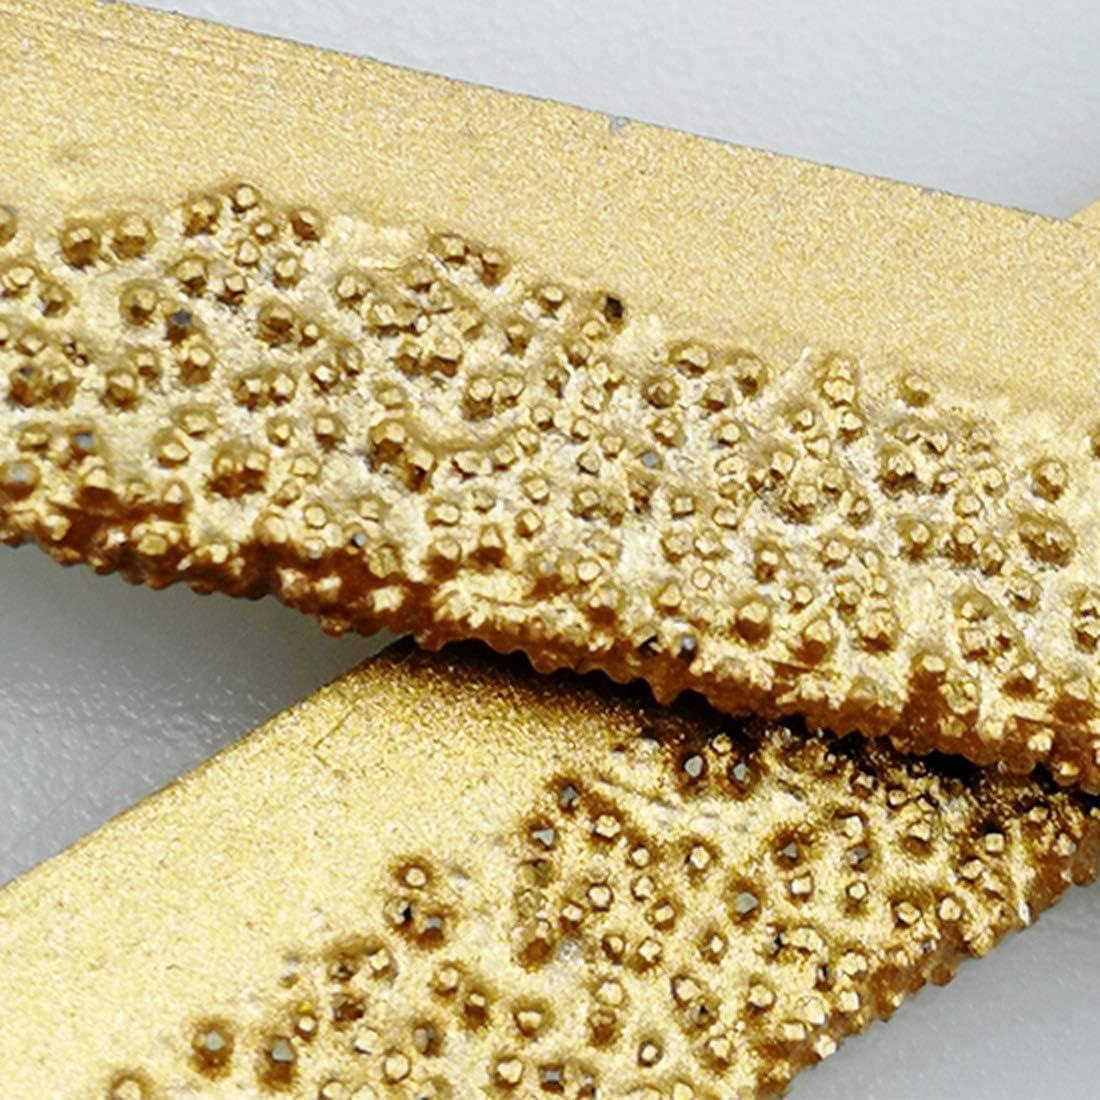 SHDIATOOL Diamant Jig S/ägeblatt f/ür Granit Marmor Fliesen Ziegel Kunststoff 4 Zoll 100mm Hohe Professionelle Qualit/ät Vakuum Gel/ötete Trennscheibe